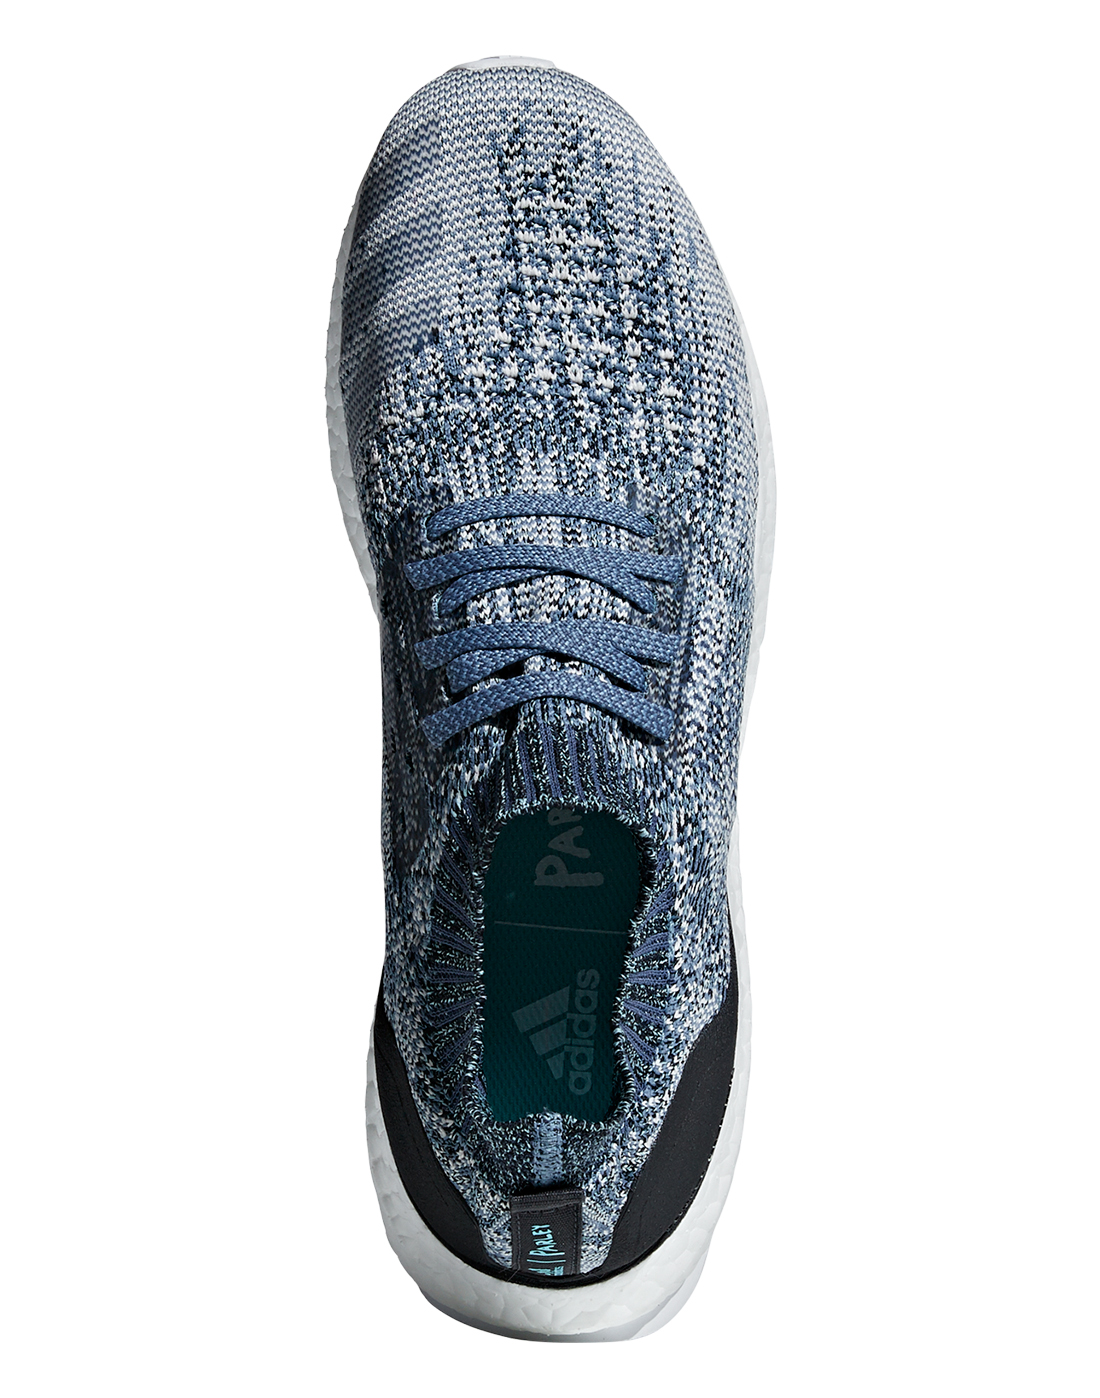 ff02e890f99 Men s adidas Ultraboost Uncaged Parley